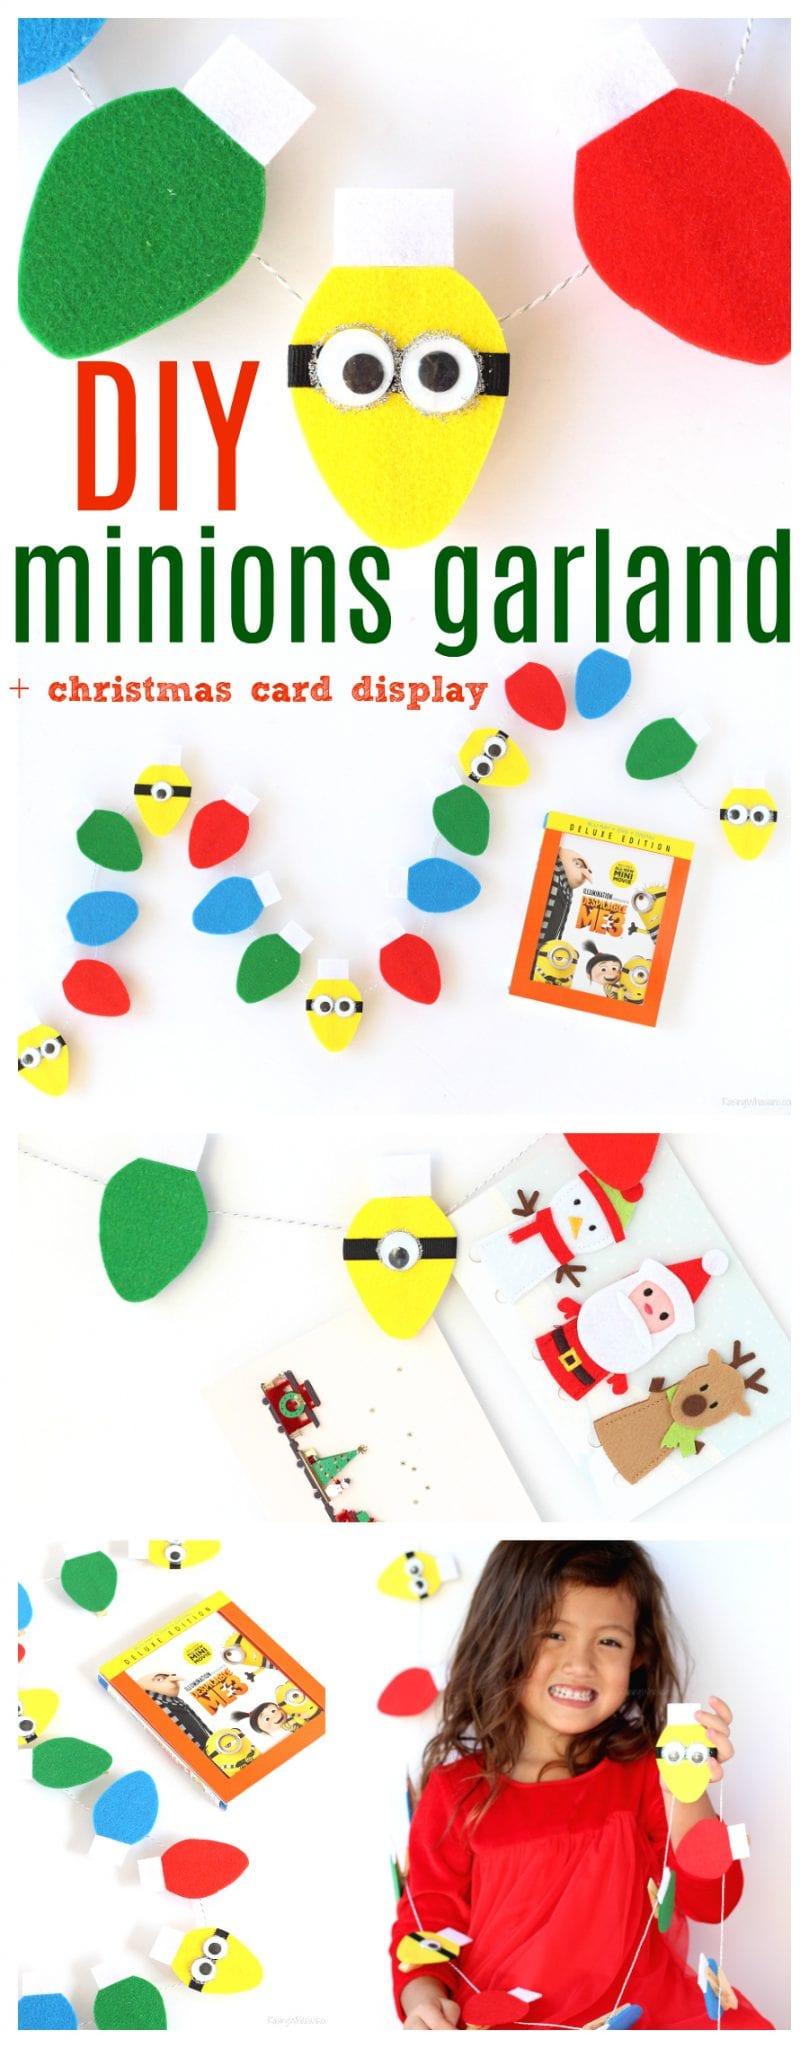 DIY minions garland pinterest